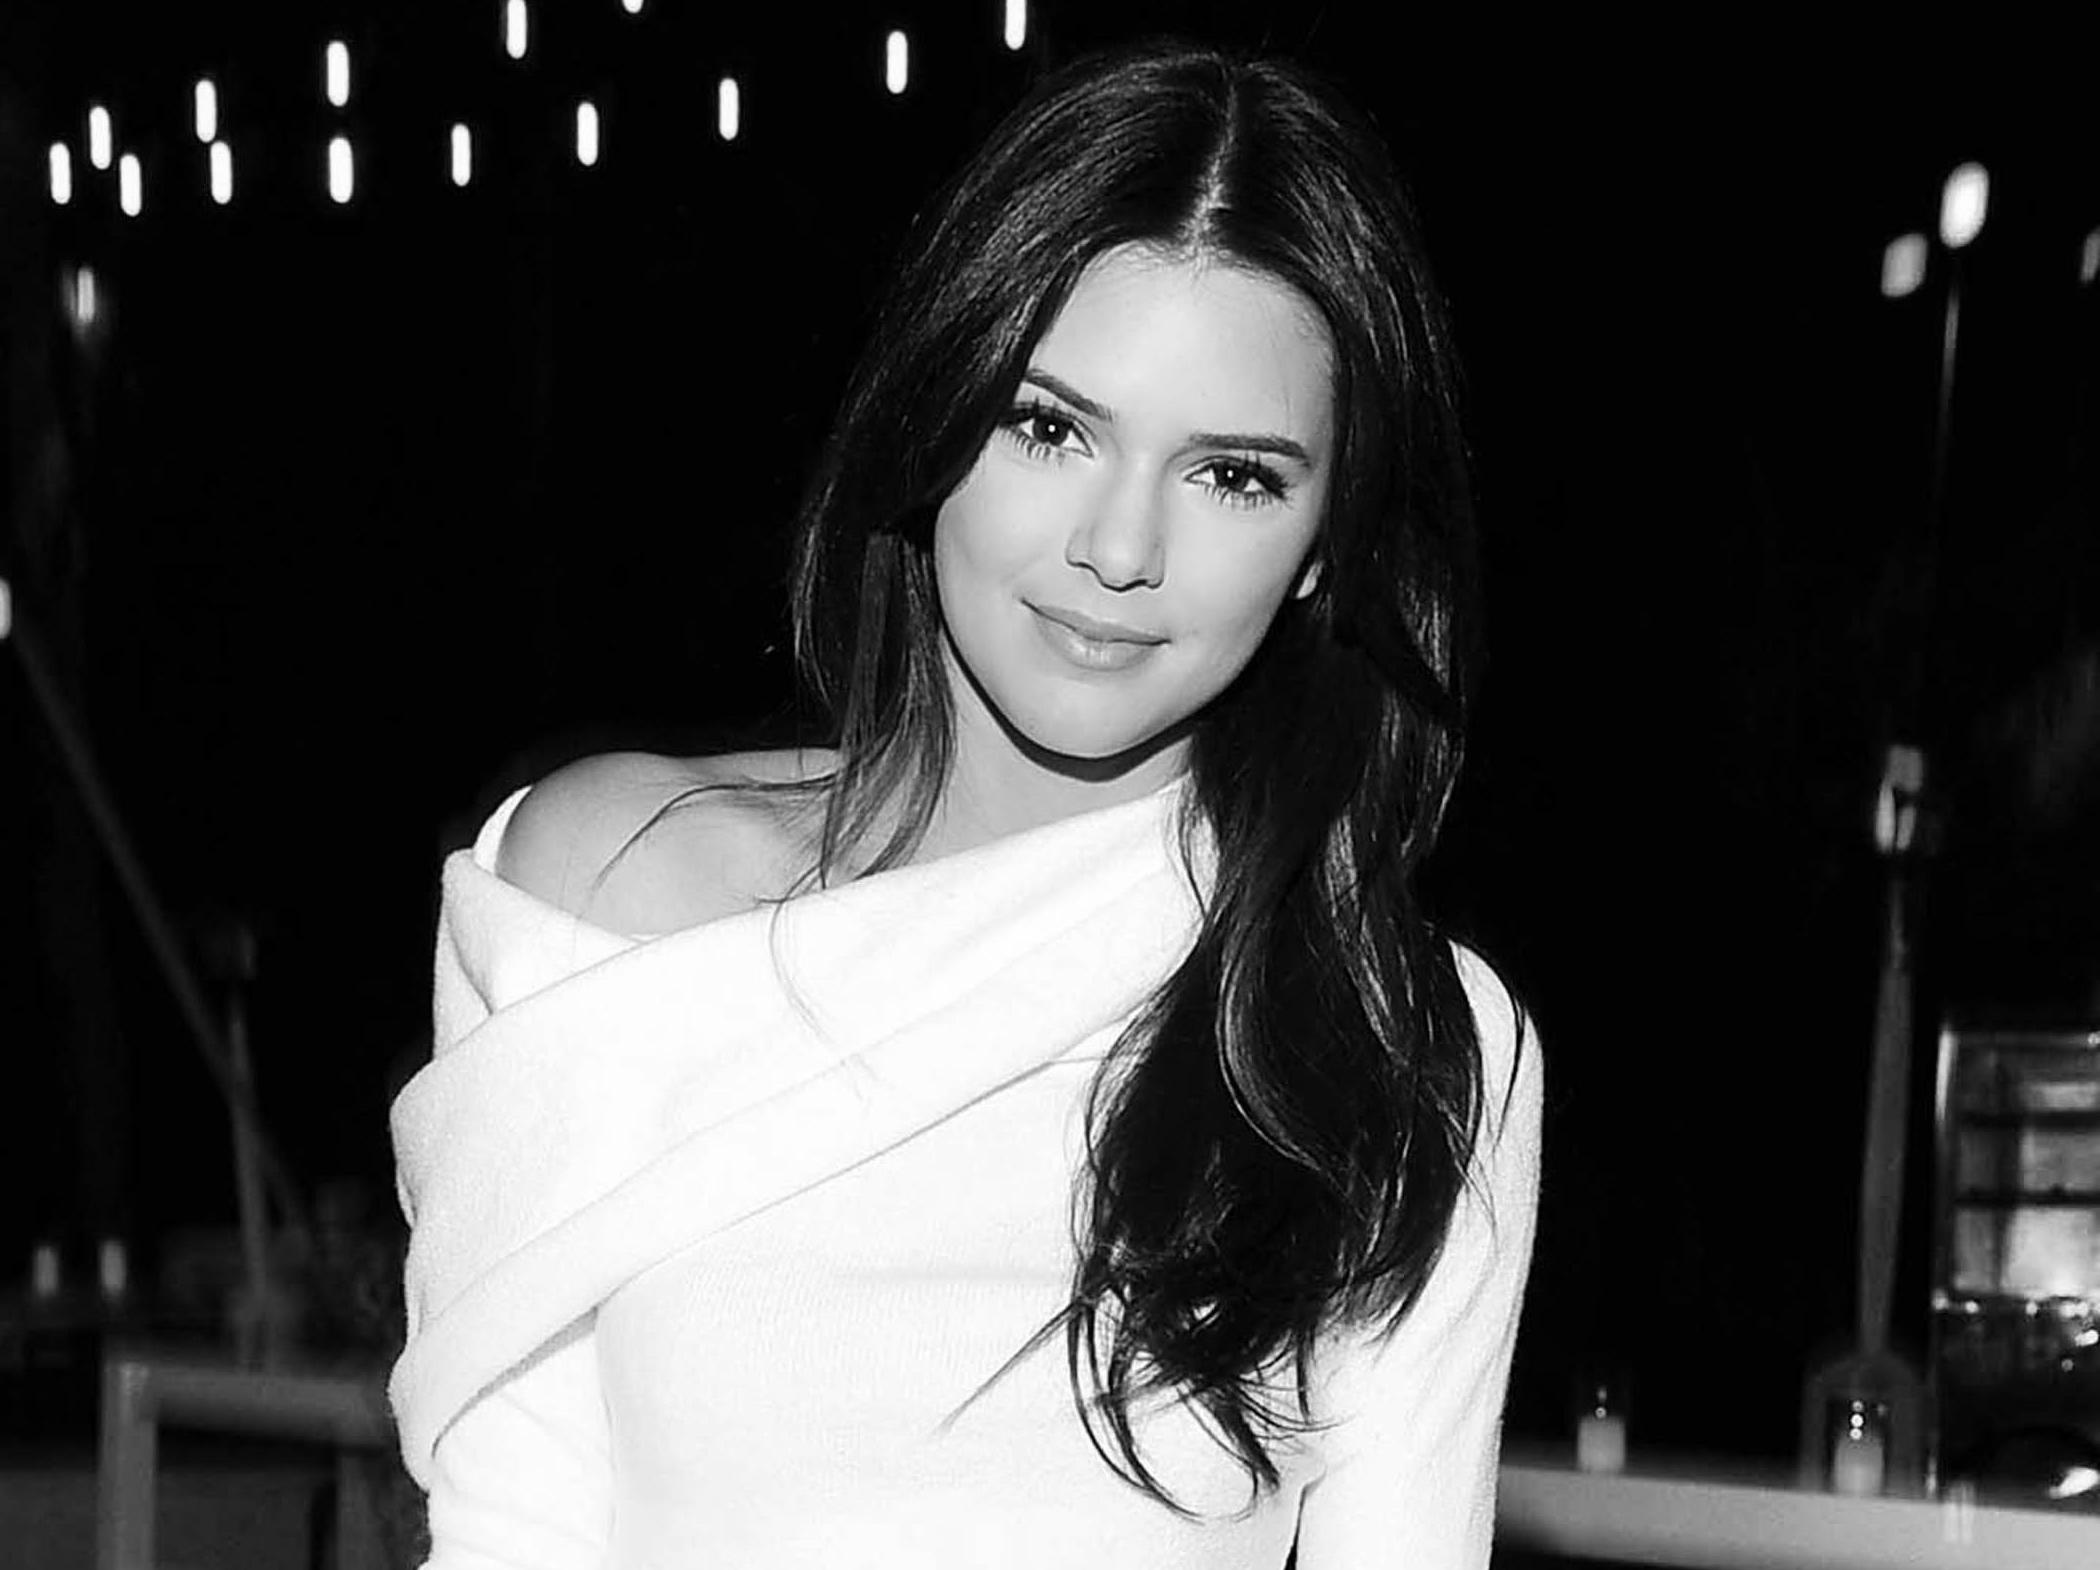 Kendall Jenner HD Wallpaper Background Image 2100x1570 ID 2100x1570